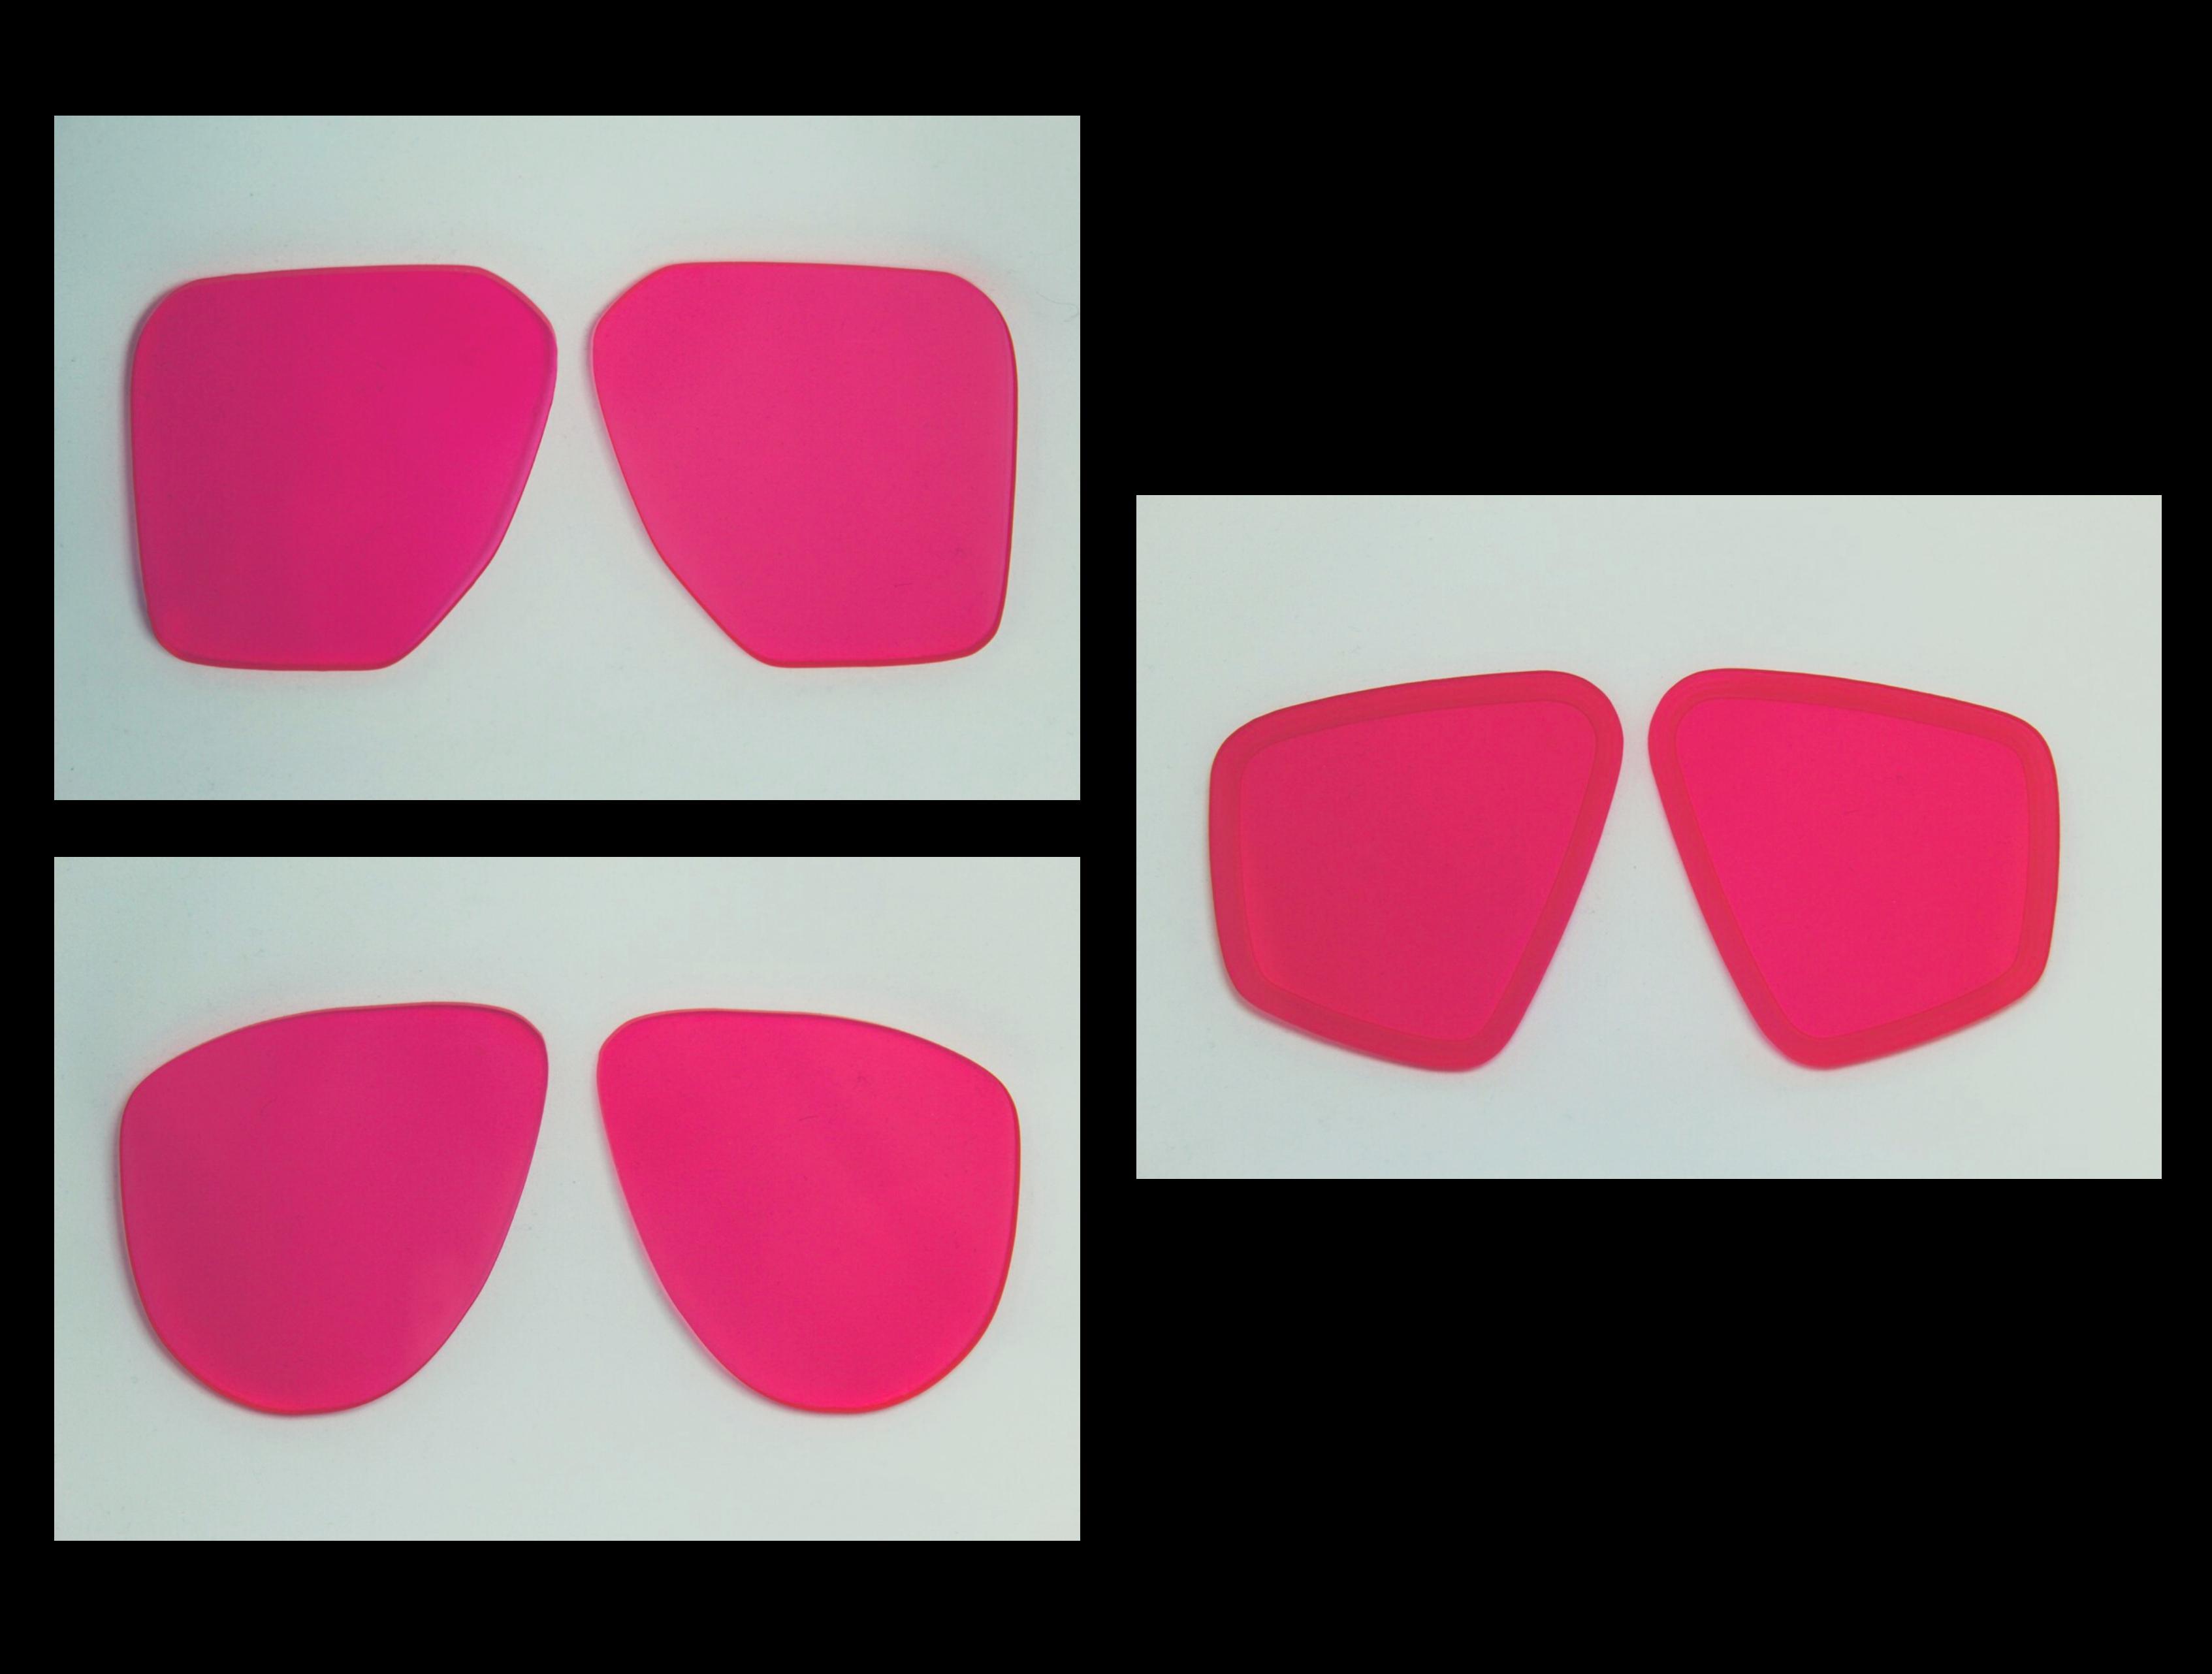 SeaVision Color Correcting Lenses